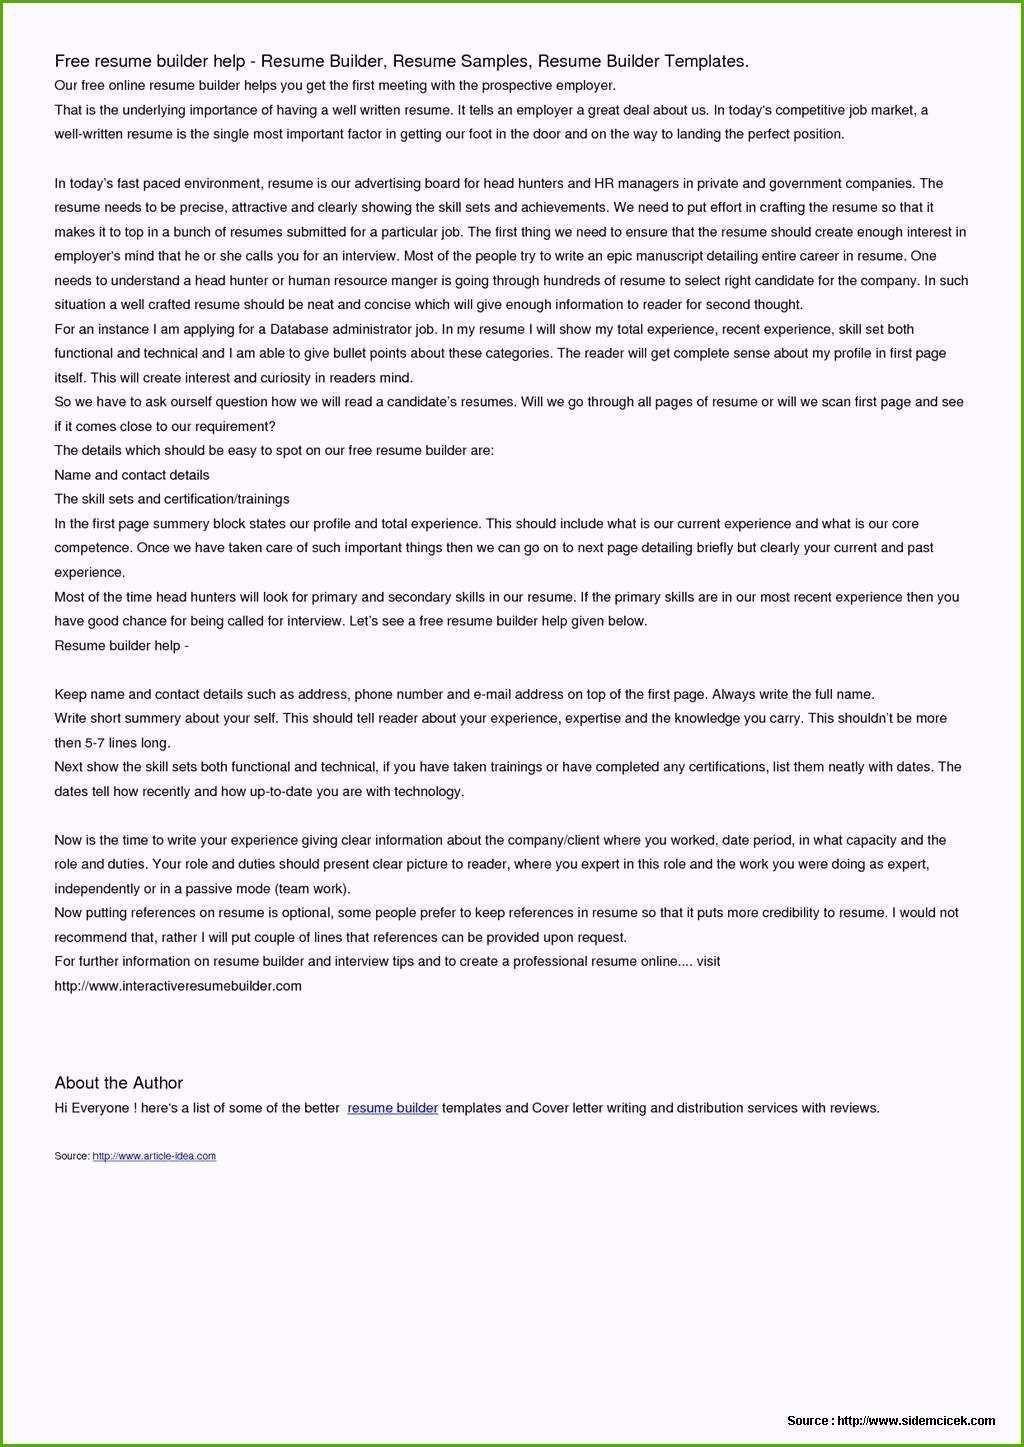 resume template, resume template free, resume template